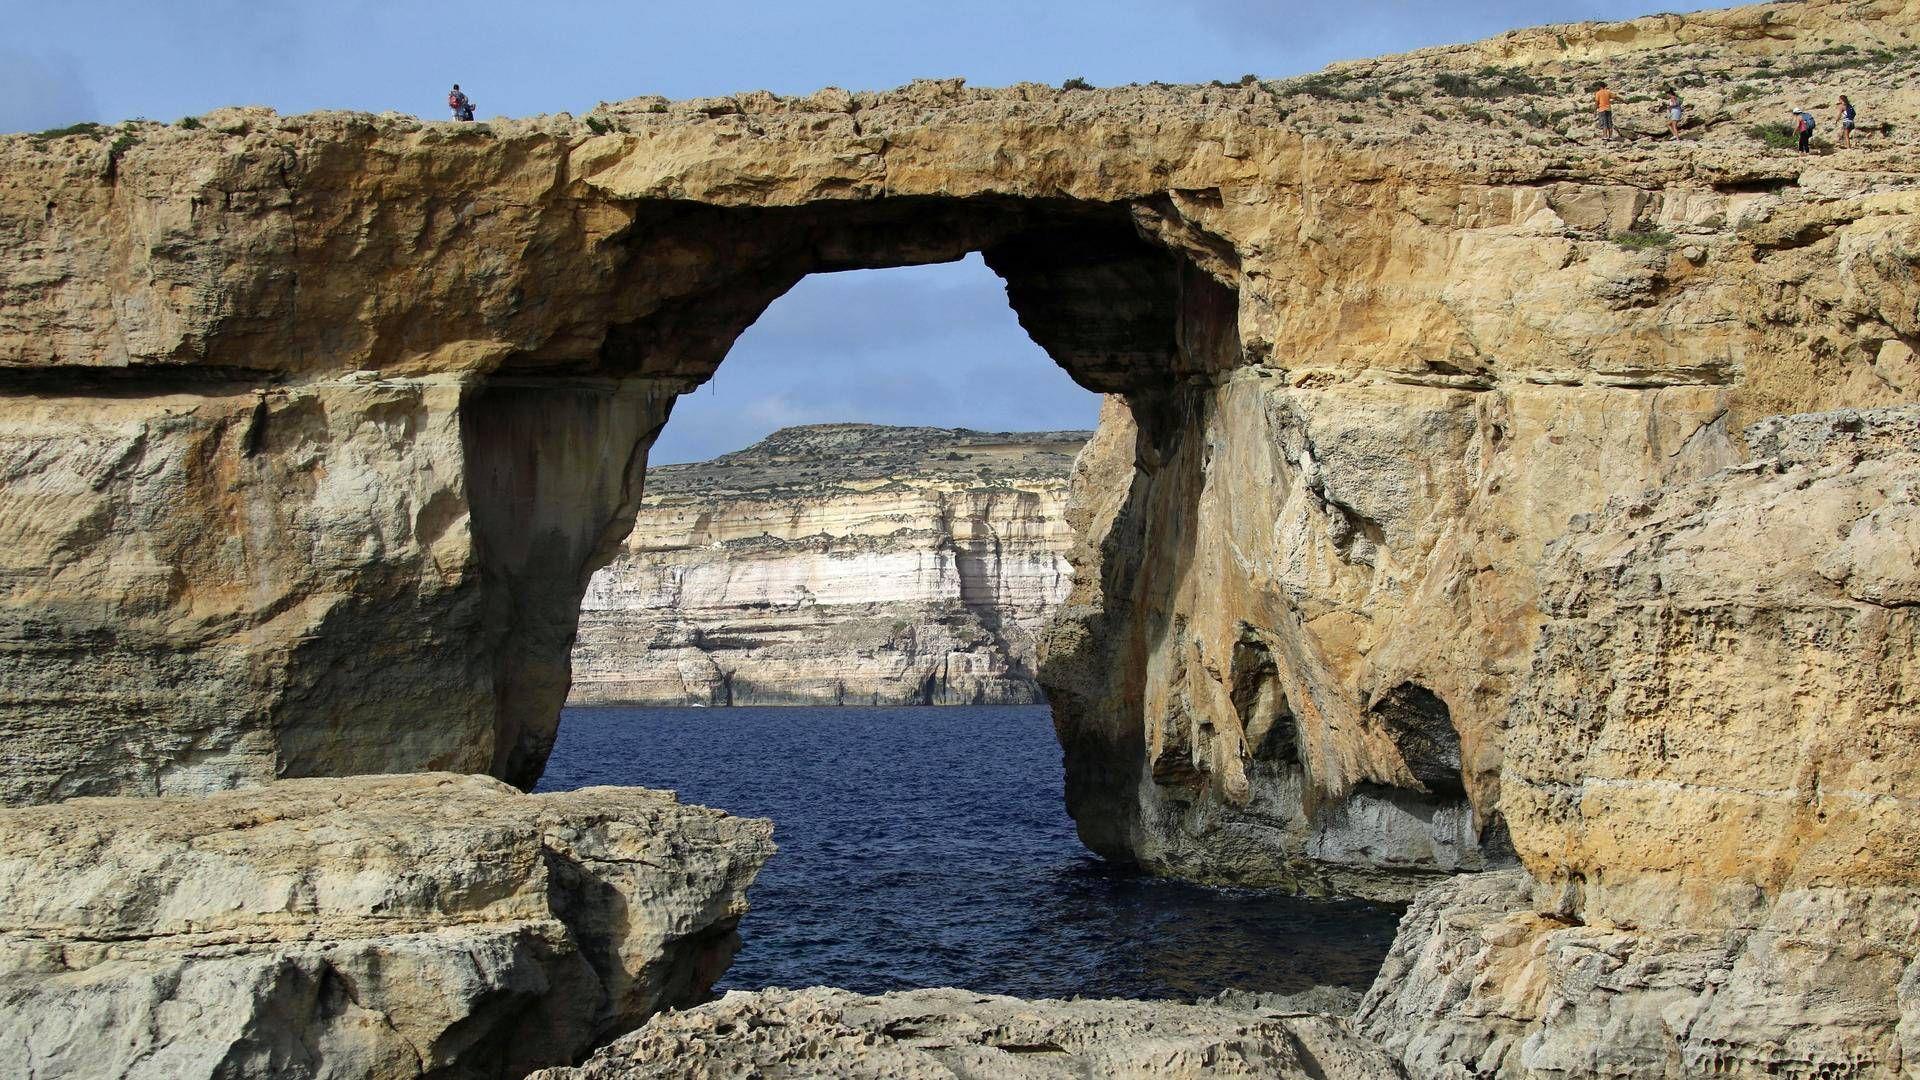 Eroosio: Game of Thronesistakin tuttu Maltan luonnonihme sortui